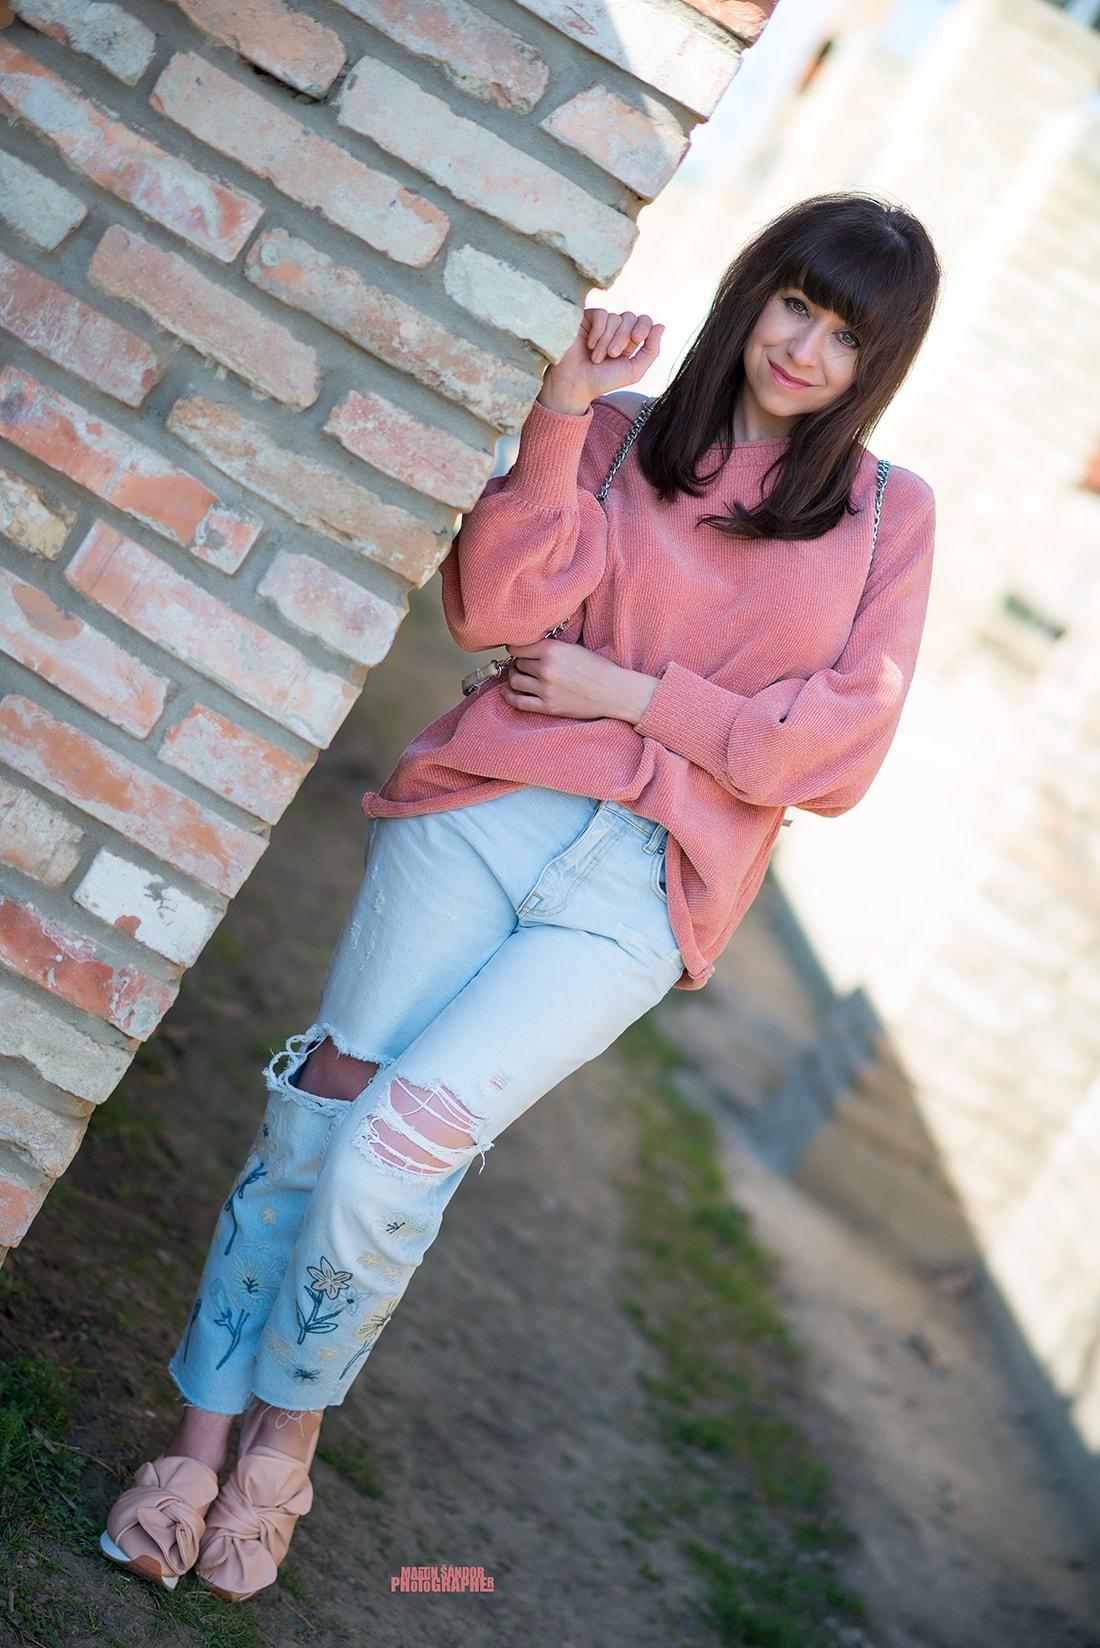 SPOMIENKA NA SVETER VĎAKA ZARE_Katharine-fashion is beautiful_Blog 9_Ženilkový sveter zo Zary_Vyšívané džínsy_Tenisky s mašľou_Katarína Jakubčová_Fashion blogger